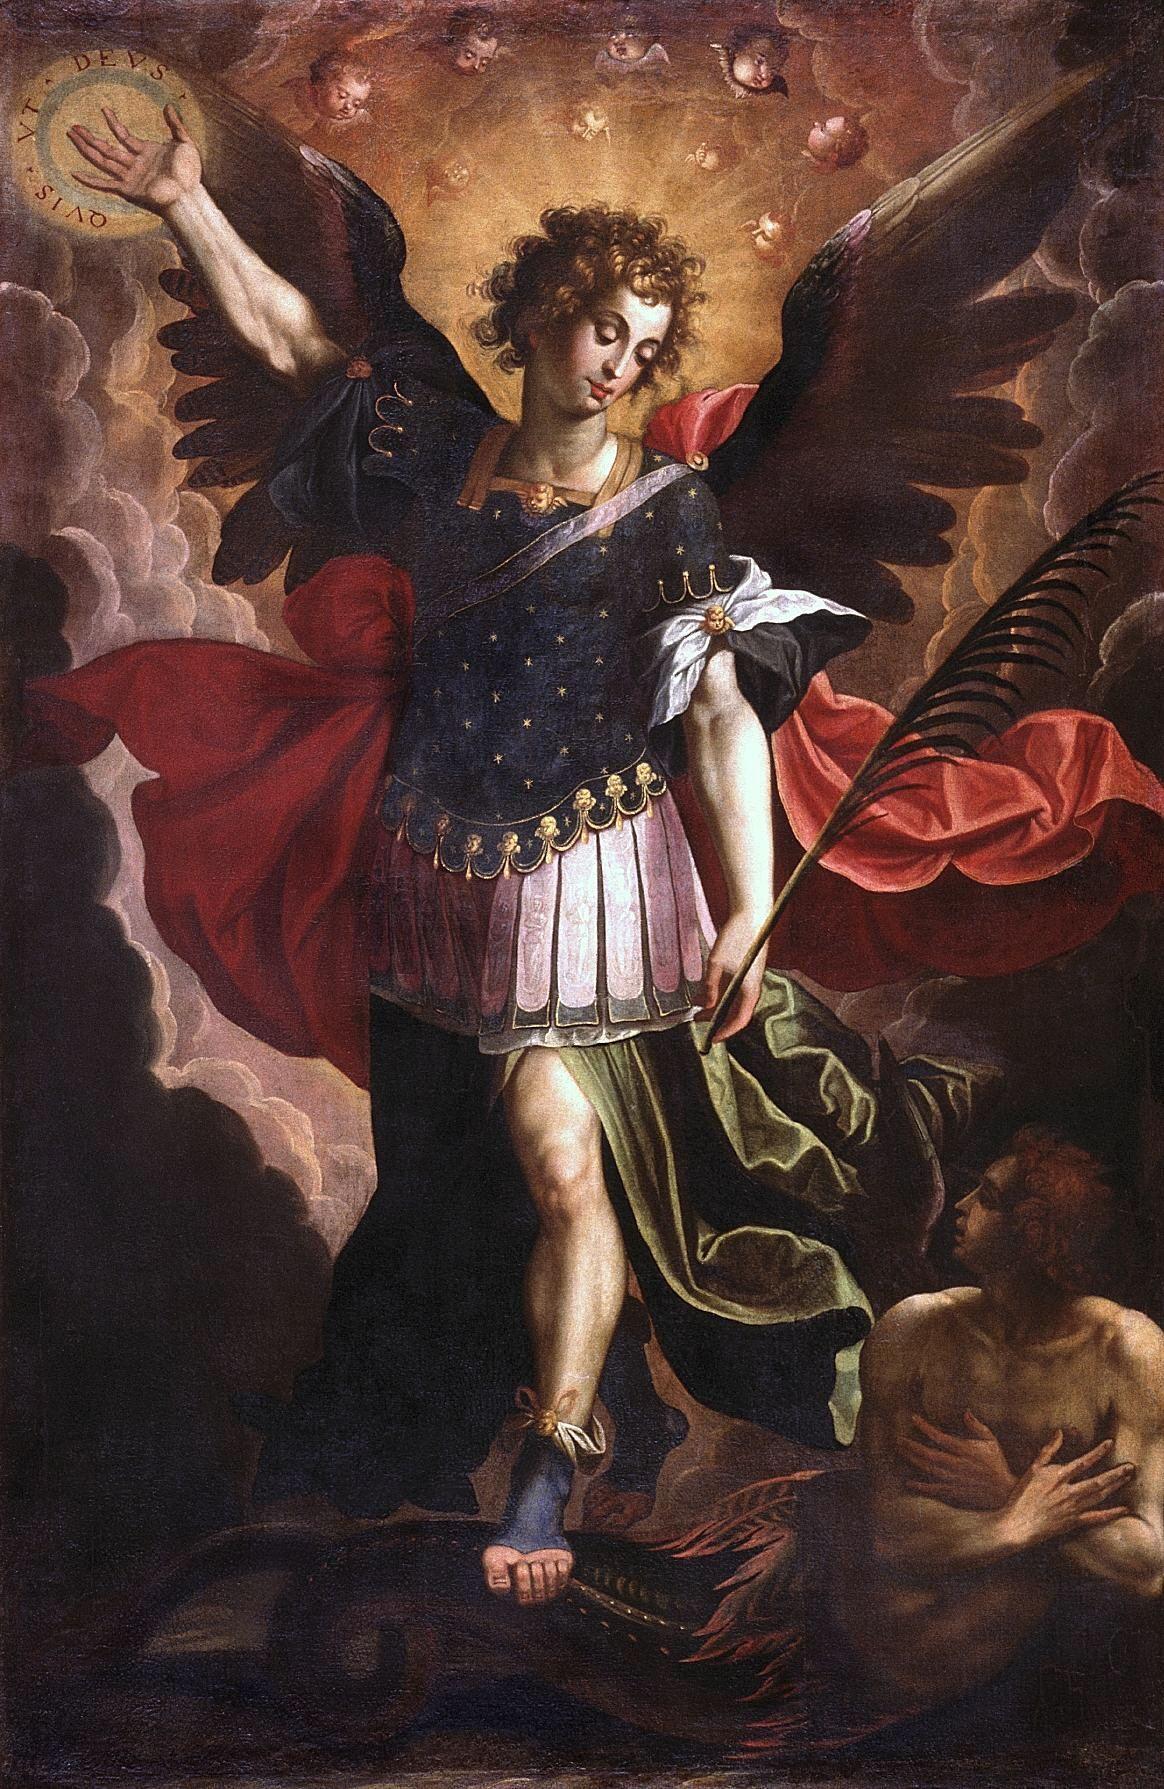 baroque angels art - Pesquisa Google | BAROQUE | Pinterest ...